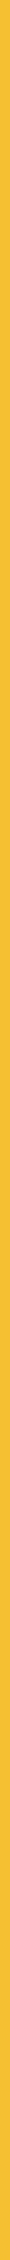 Pienso_Dingo_Adult_&_Daily_Linea